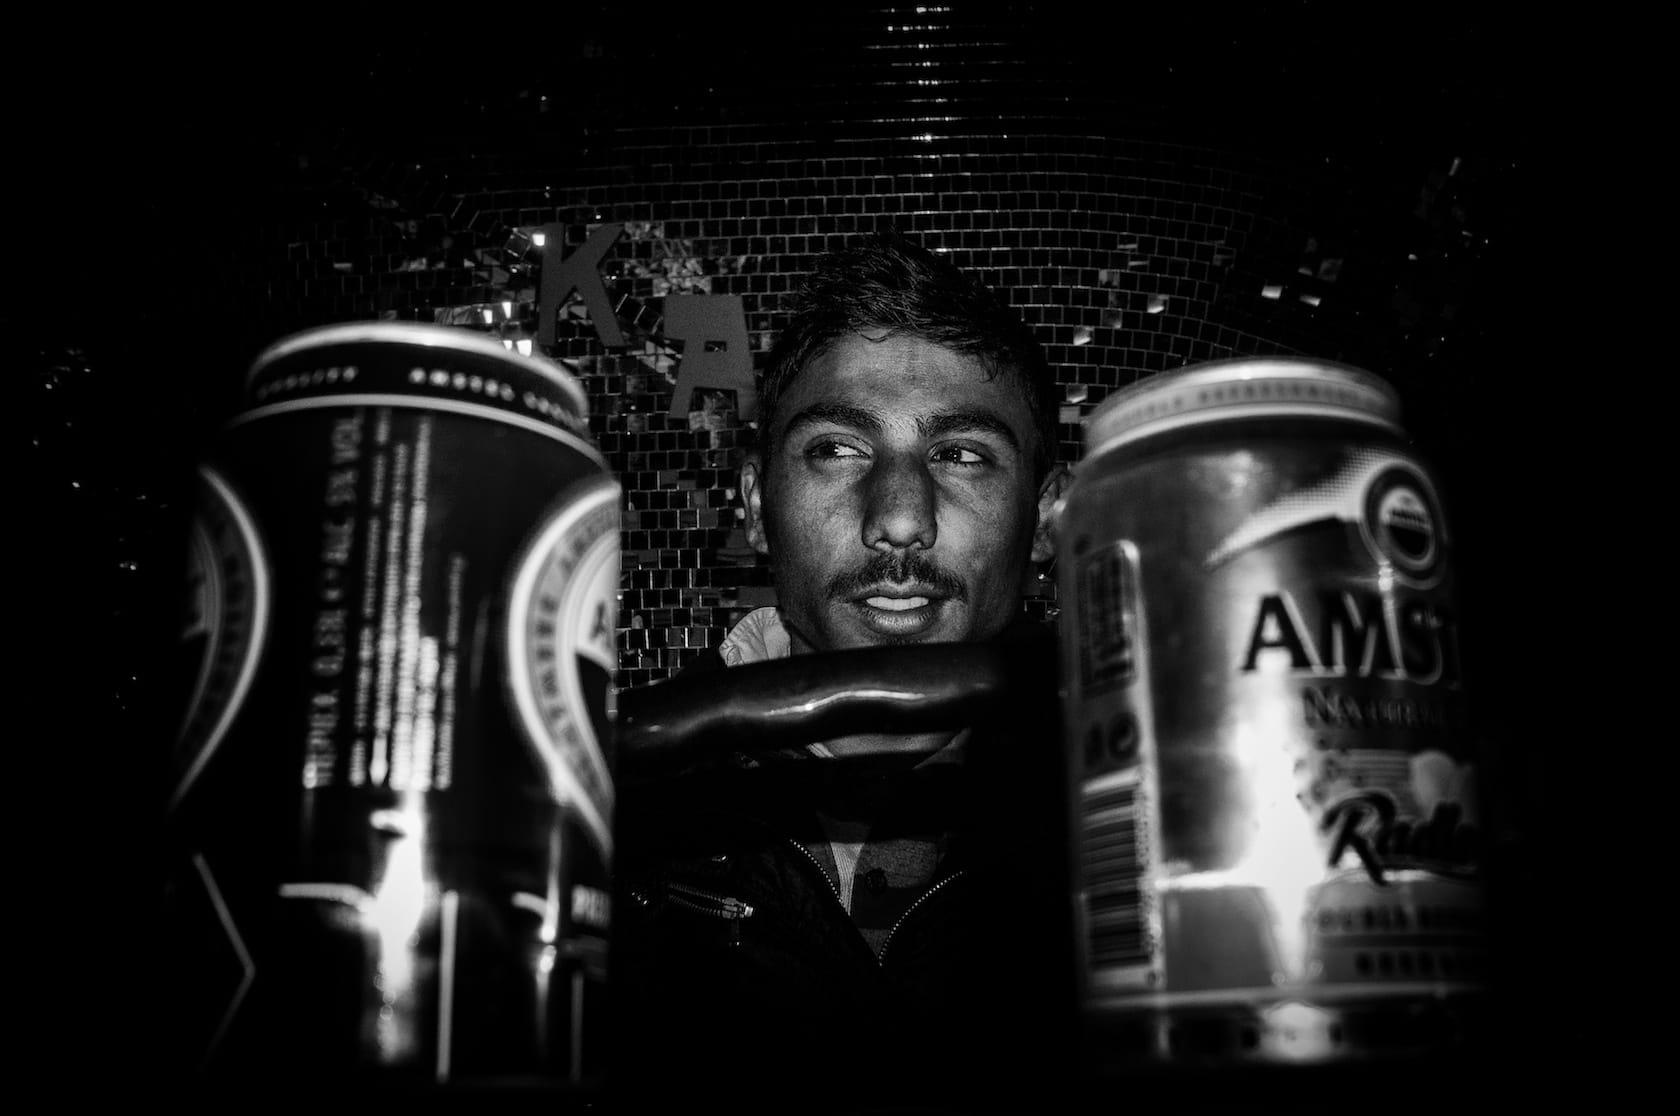 Beer - Face - Beer